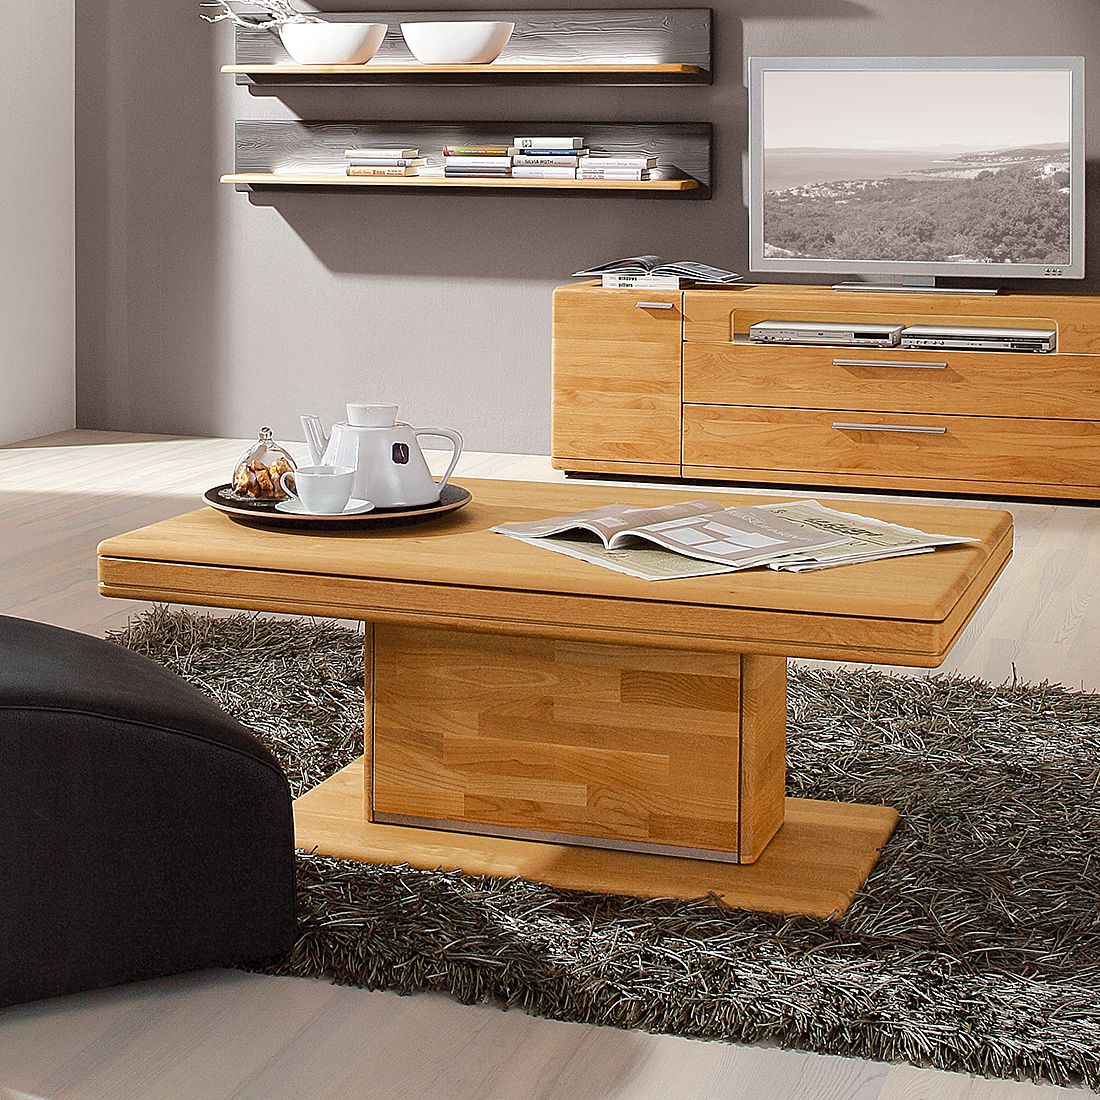 couchtisch curve ii erle massiv ohne beleuchtung. Black Bedroom Furniture Sets. Home Design Ideas